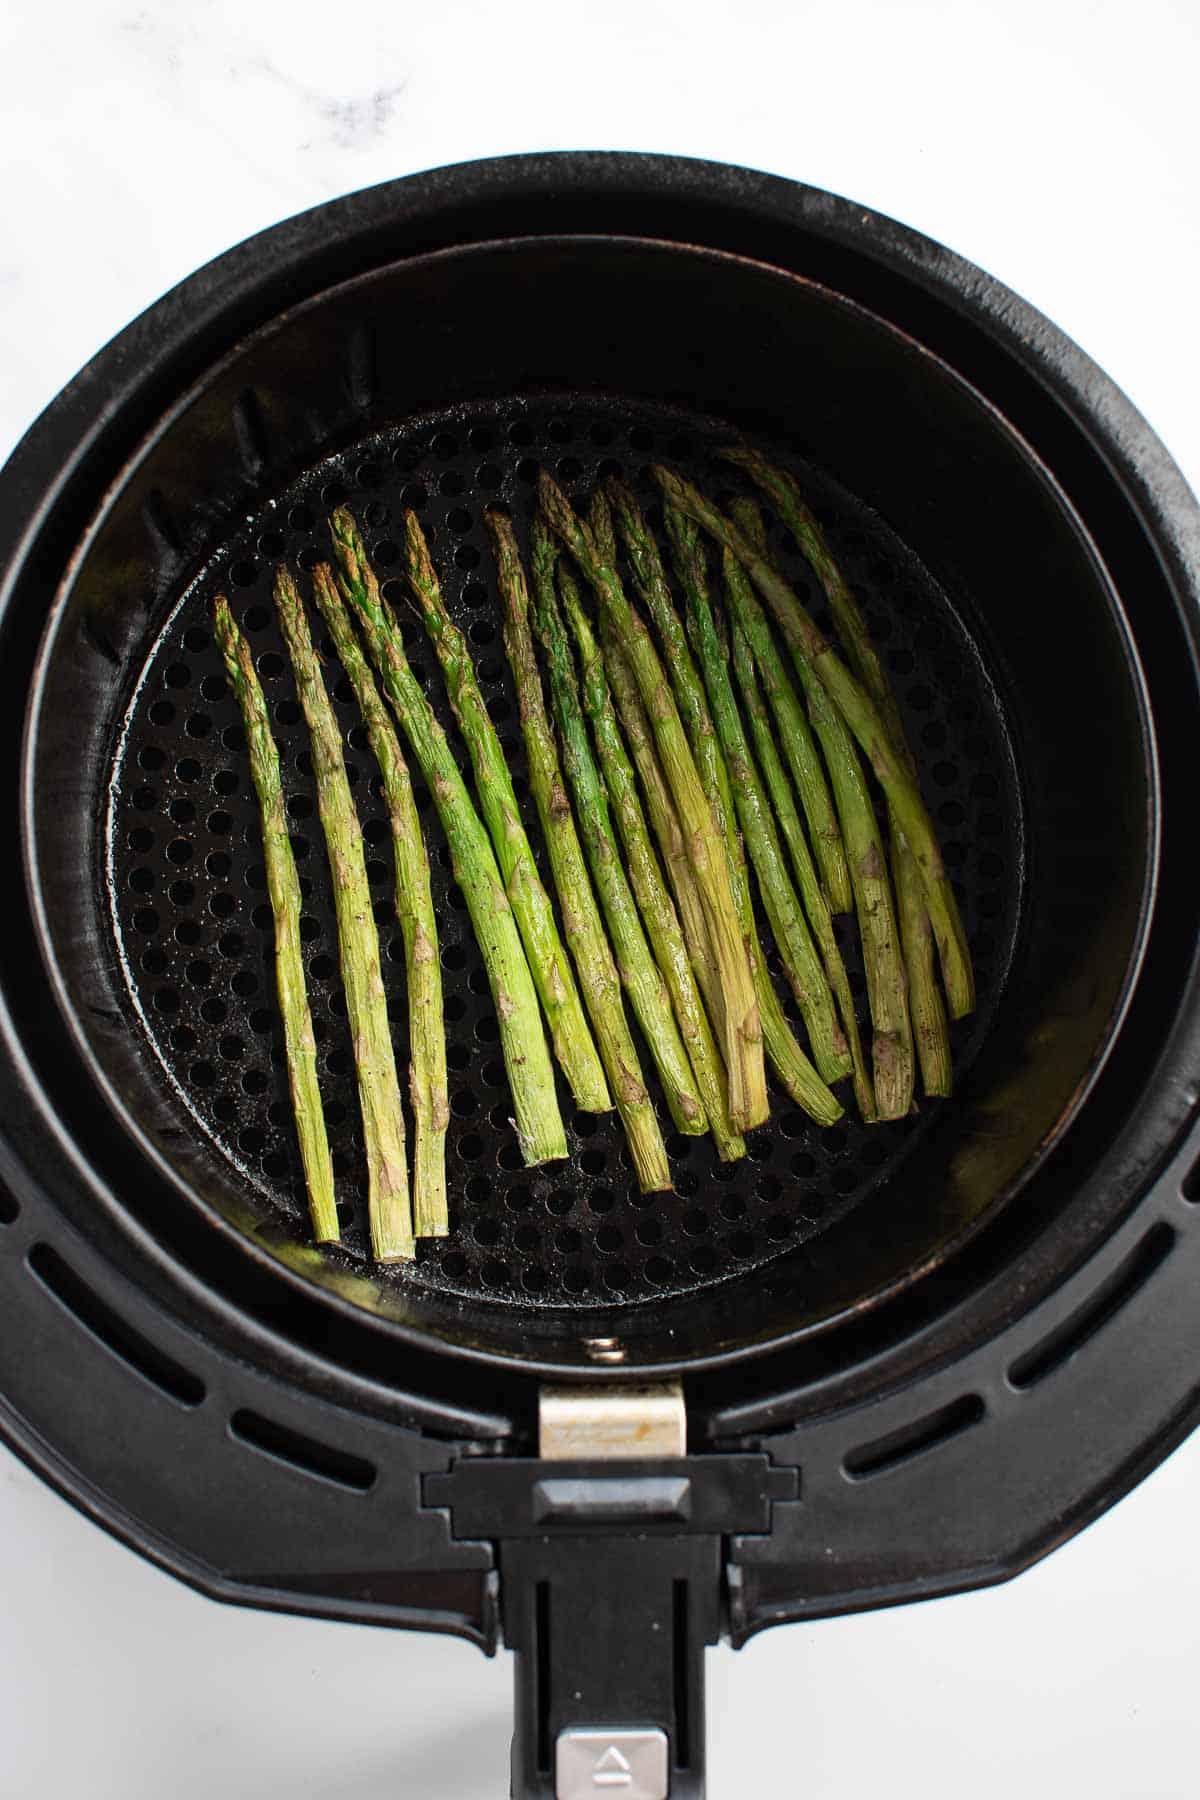 Roasted asparagus in an air fryer.